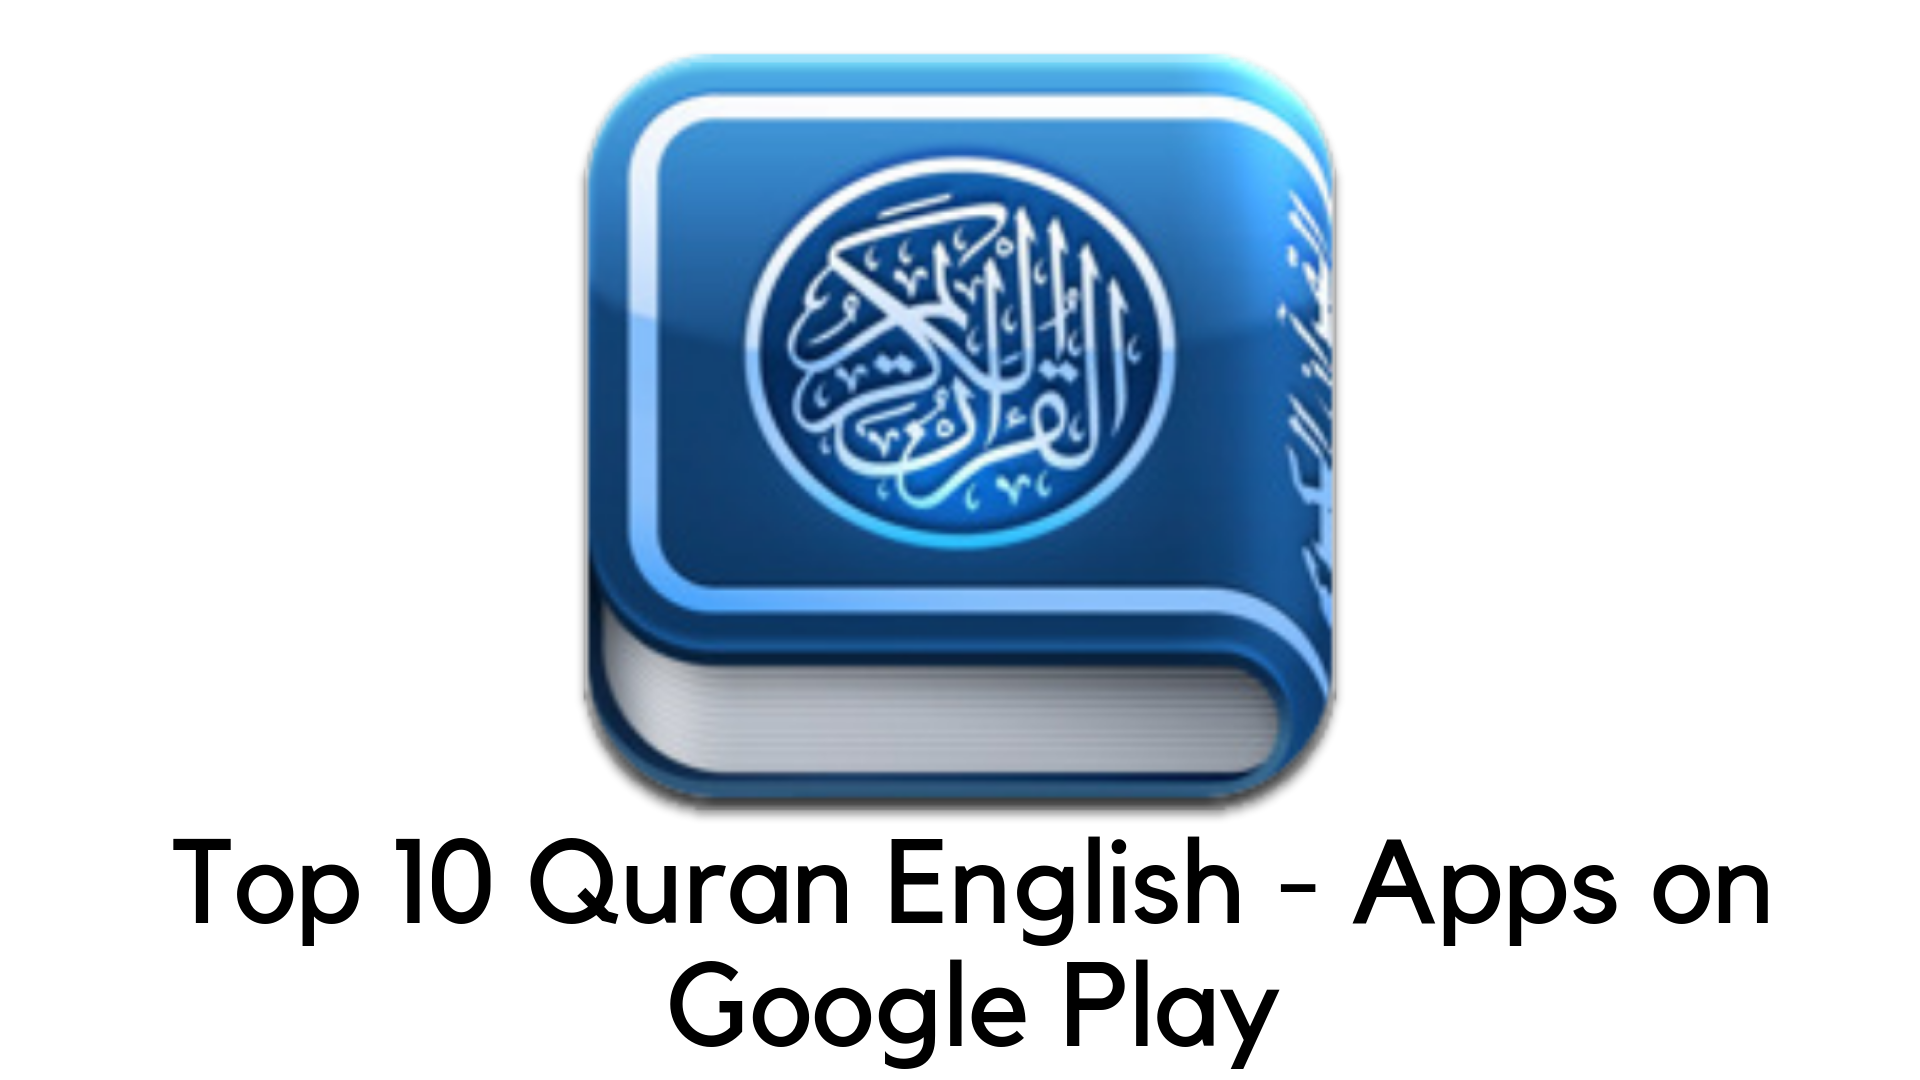 Quran English Apps